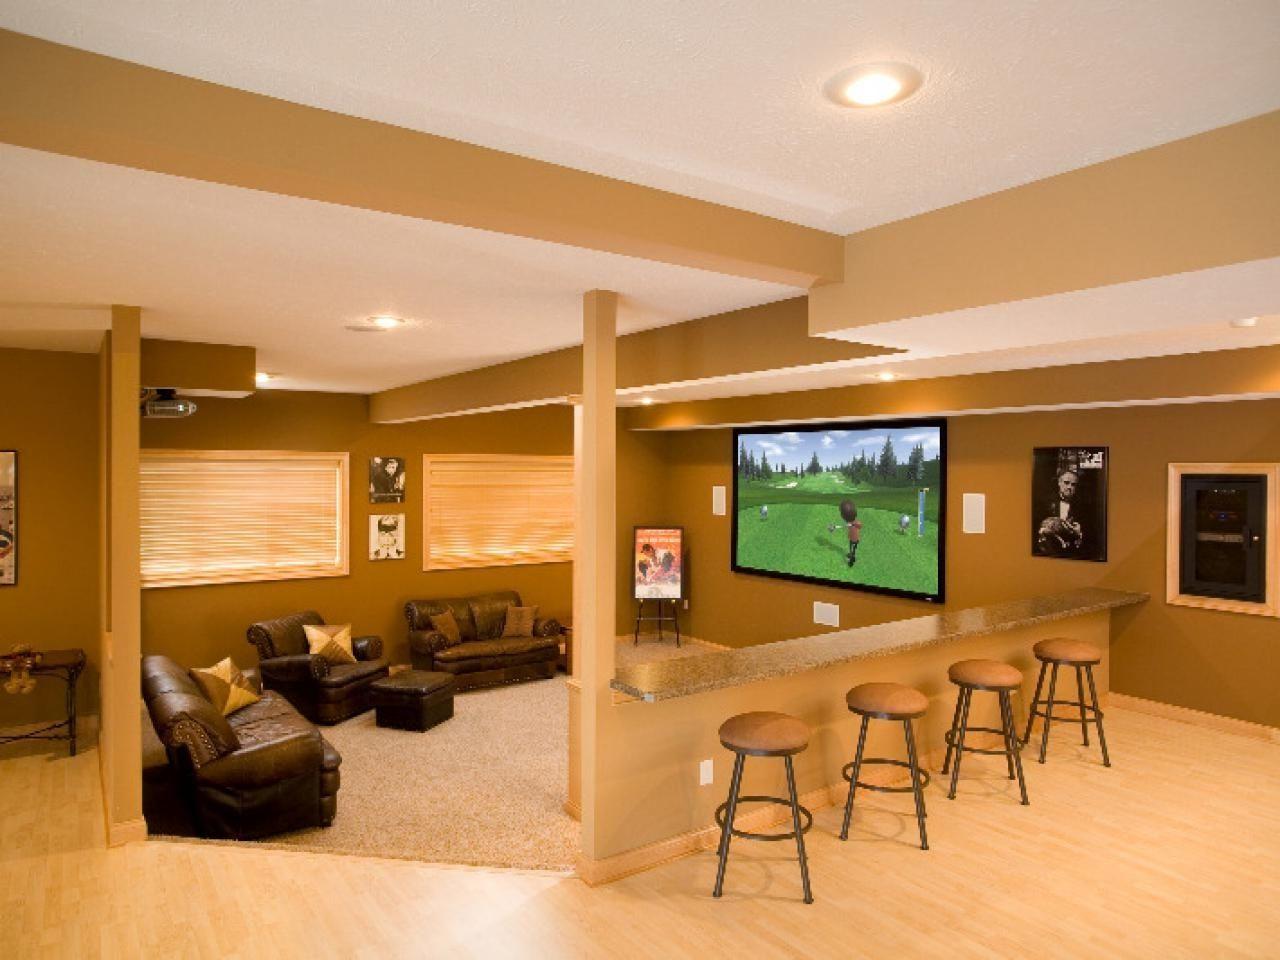 20 epic rec room ideas decoration for your family entertainment rh pinterest com